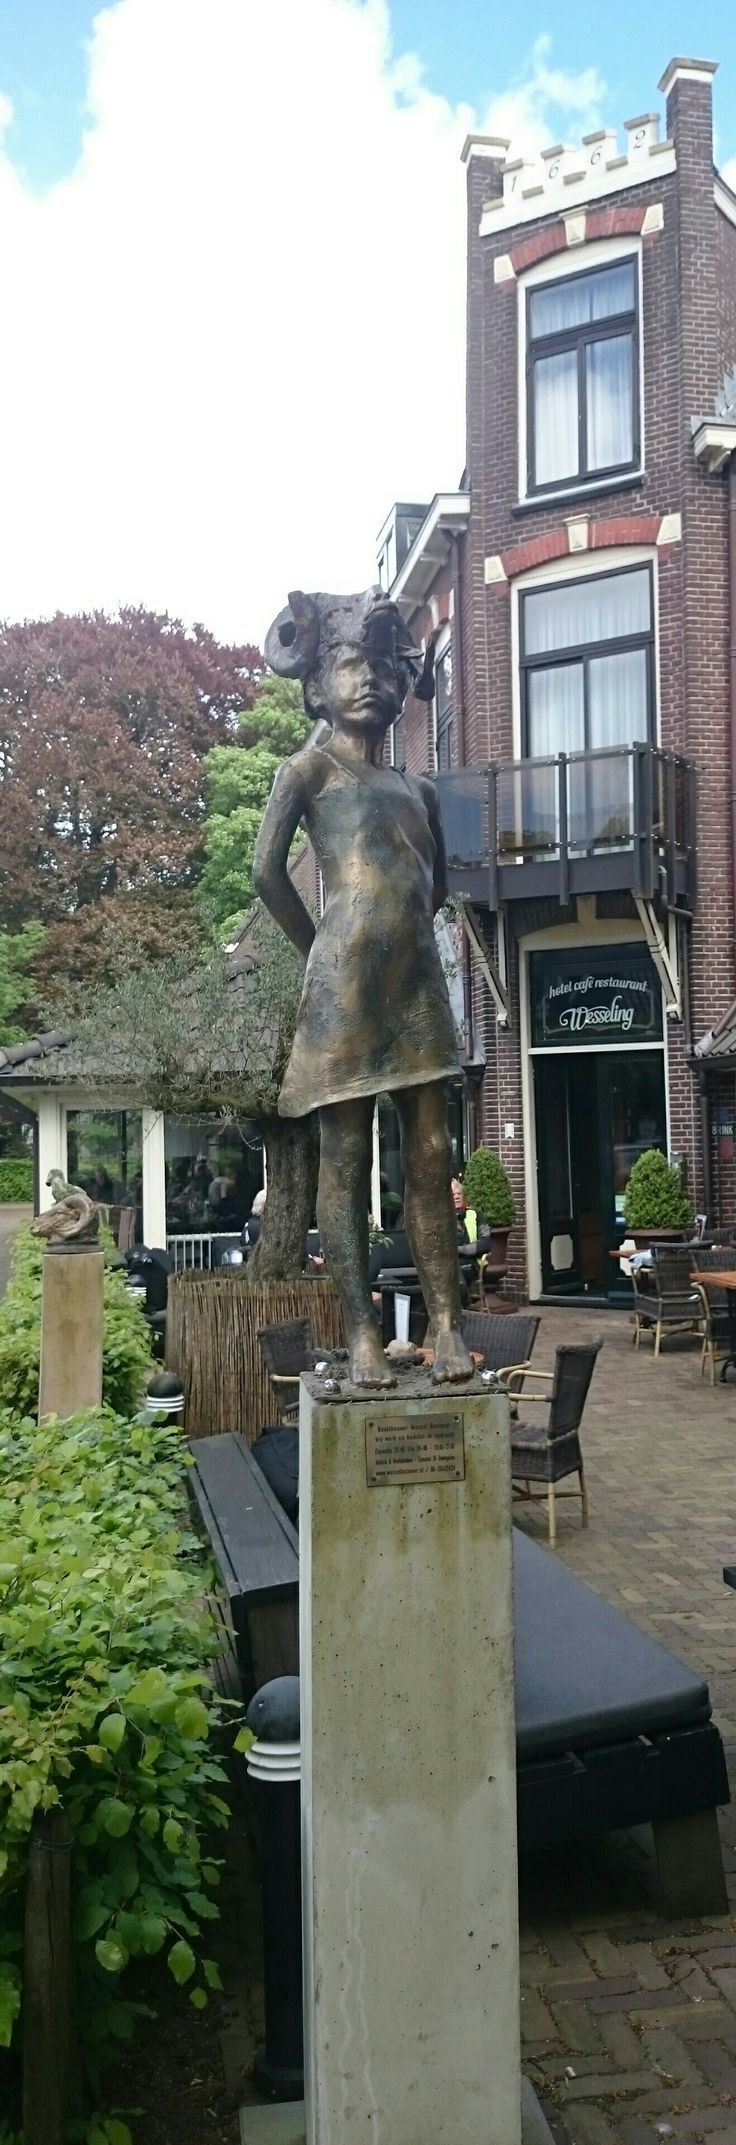 Dwingeloo The Netherlands